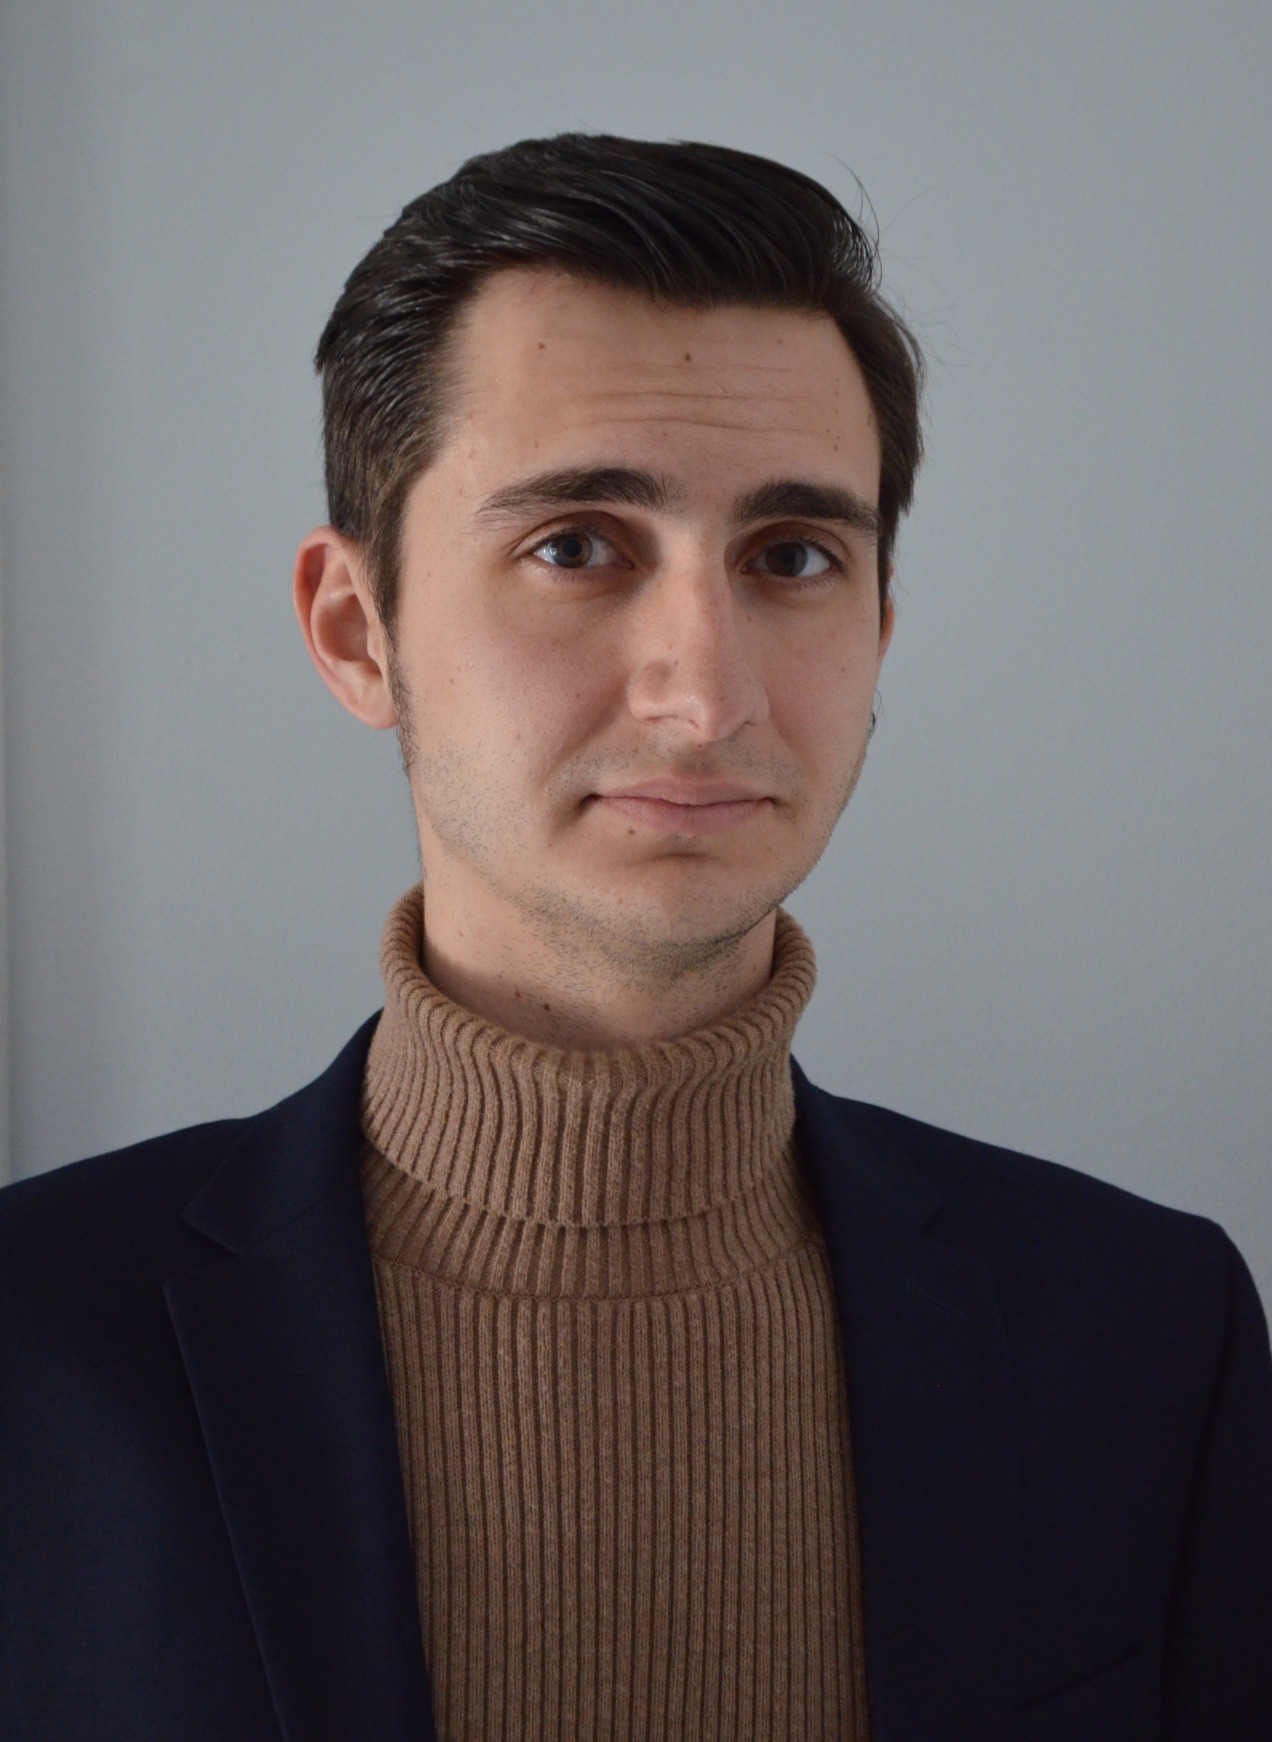 Marko Mavrovic